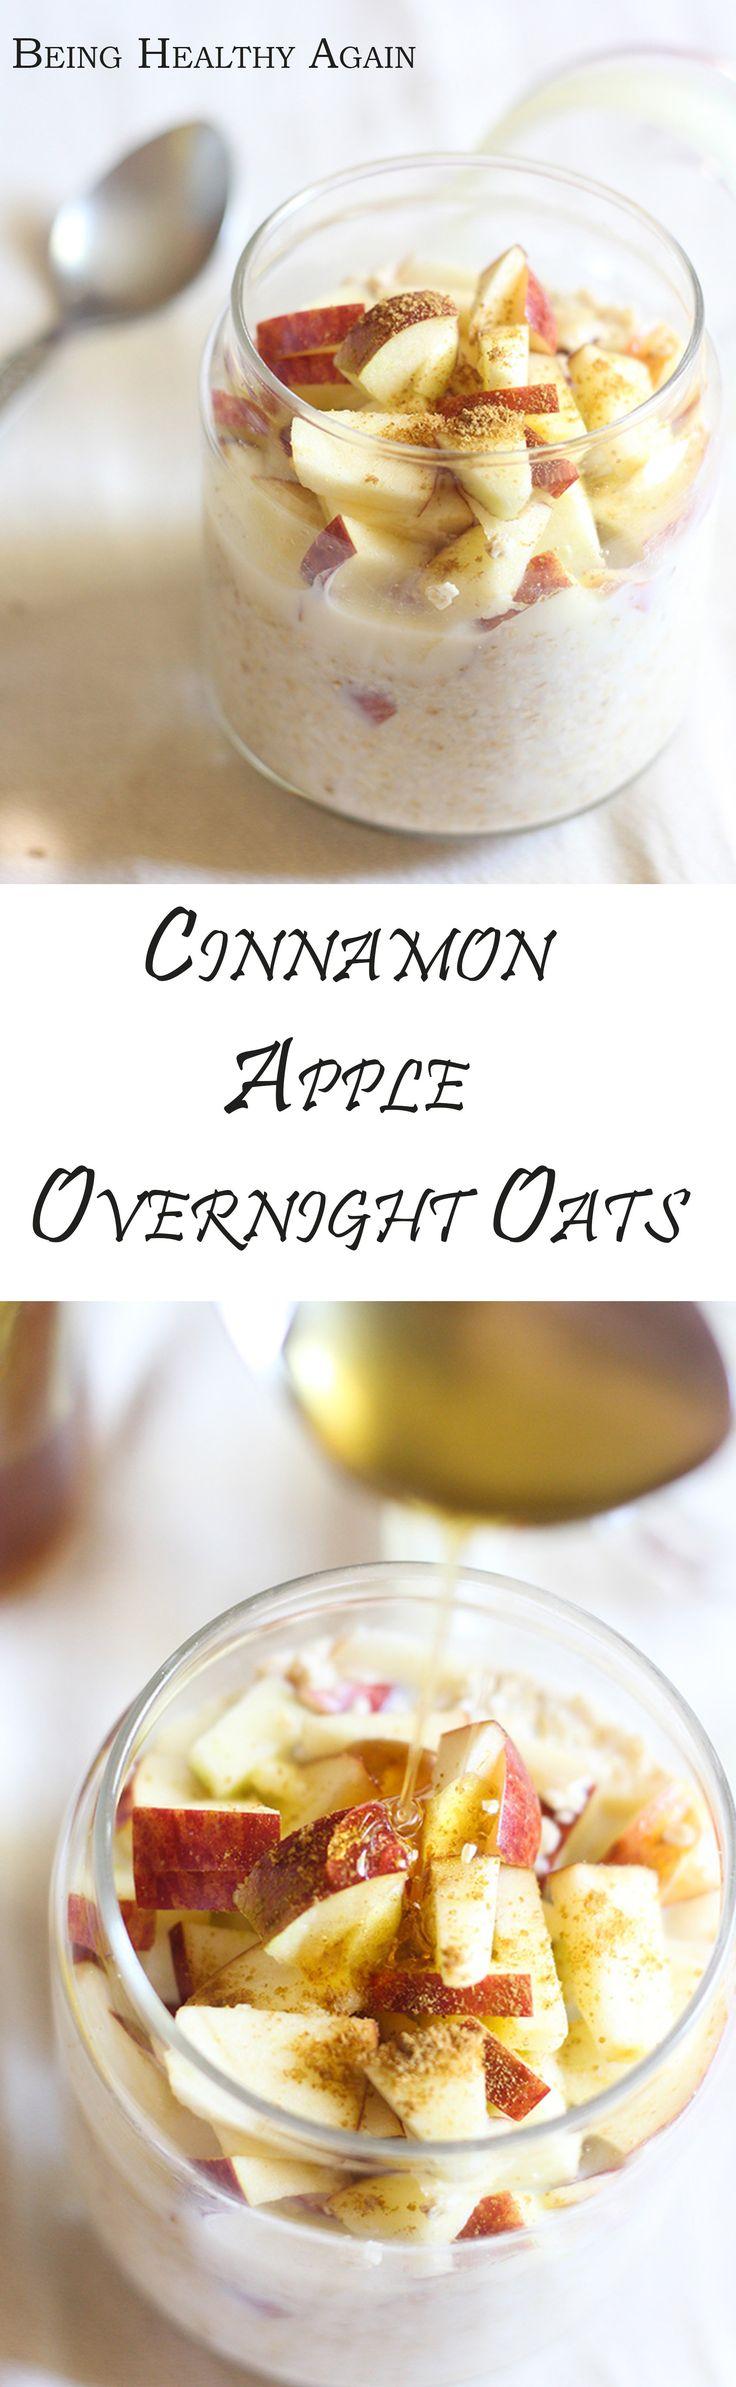 cinnamon apple overnight oats with honey